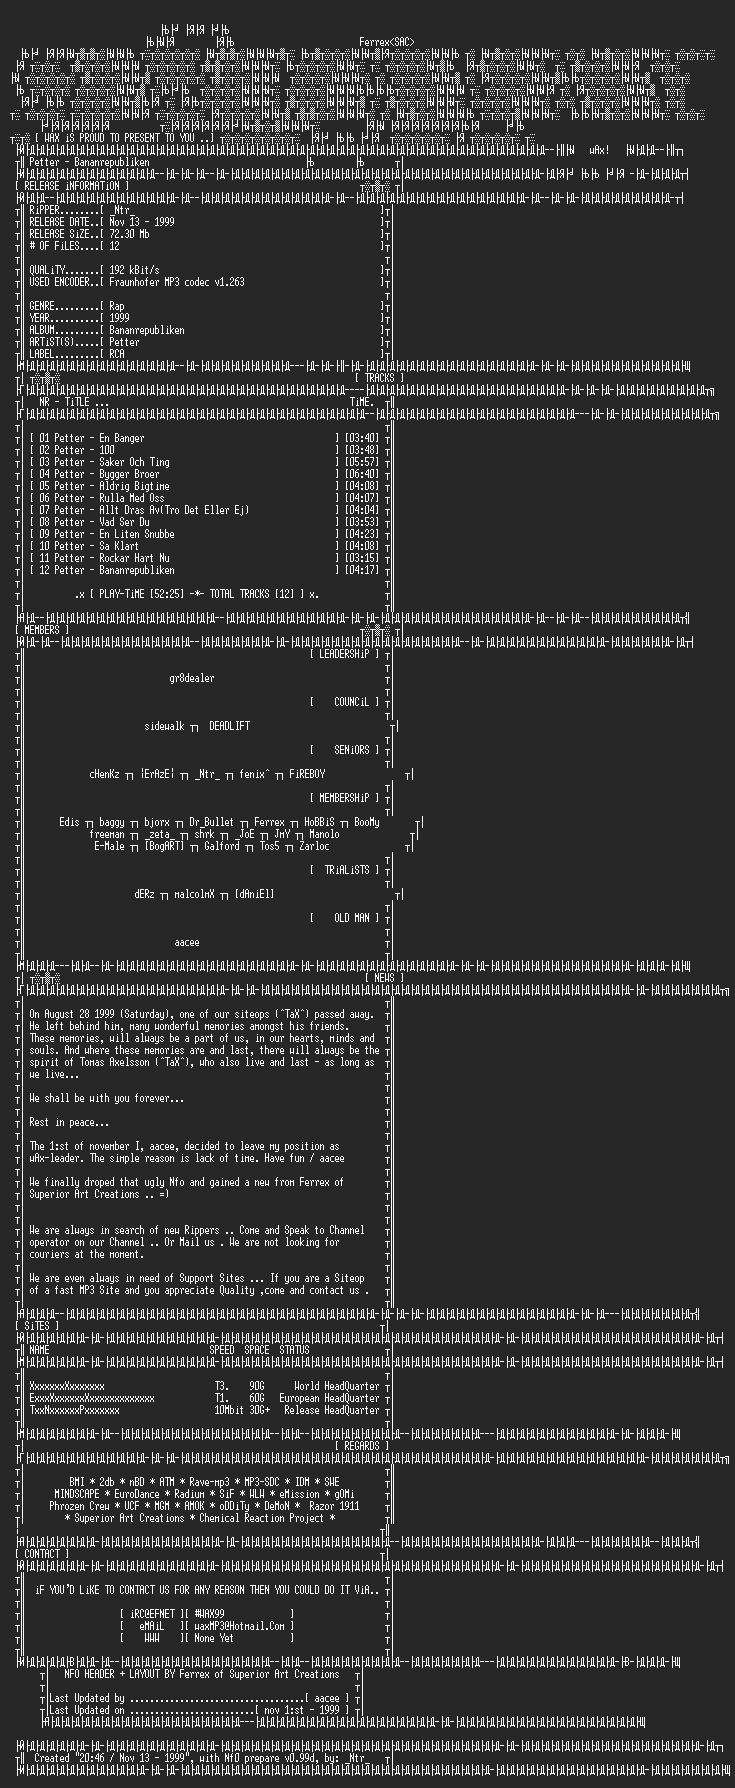 NFO file for Petter_-_Bananrepubliken-1999-wAx